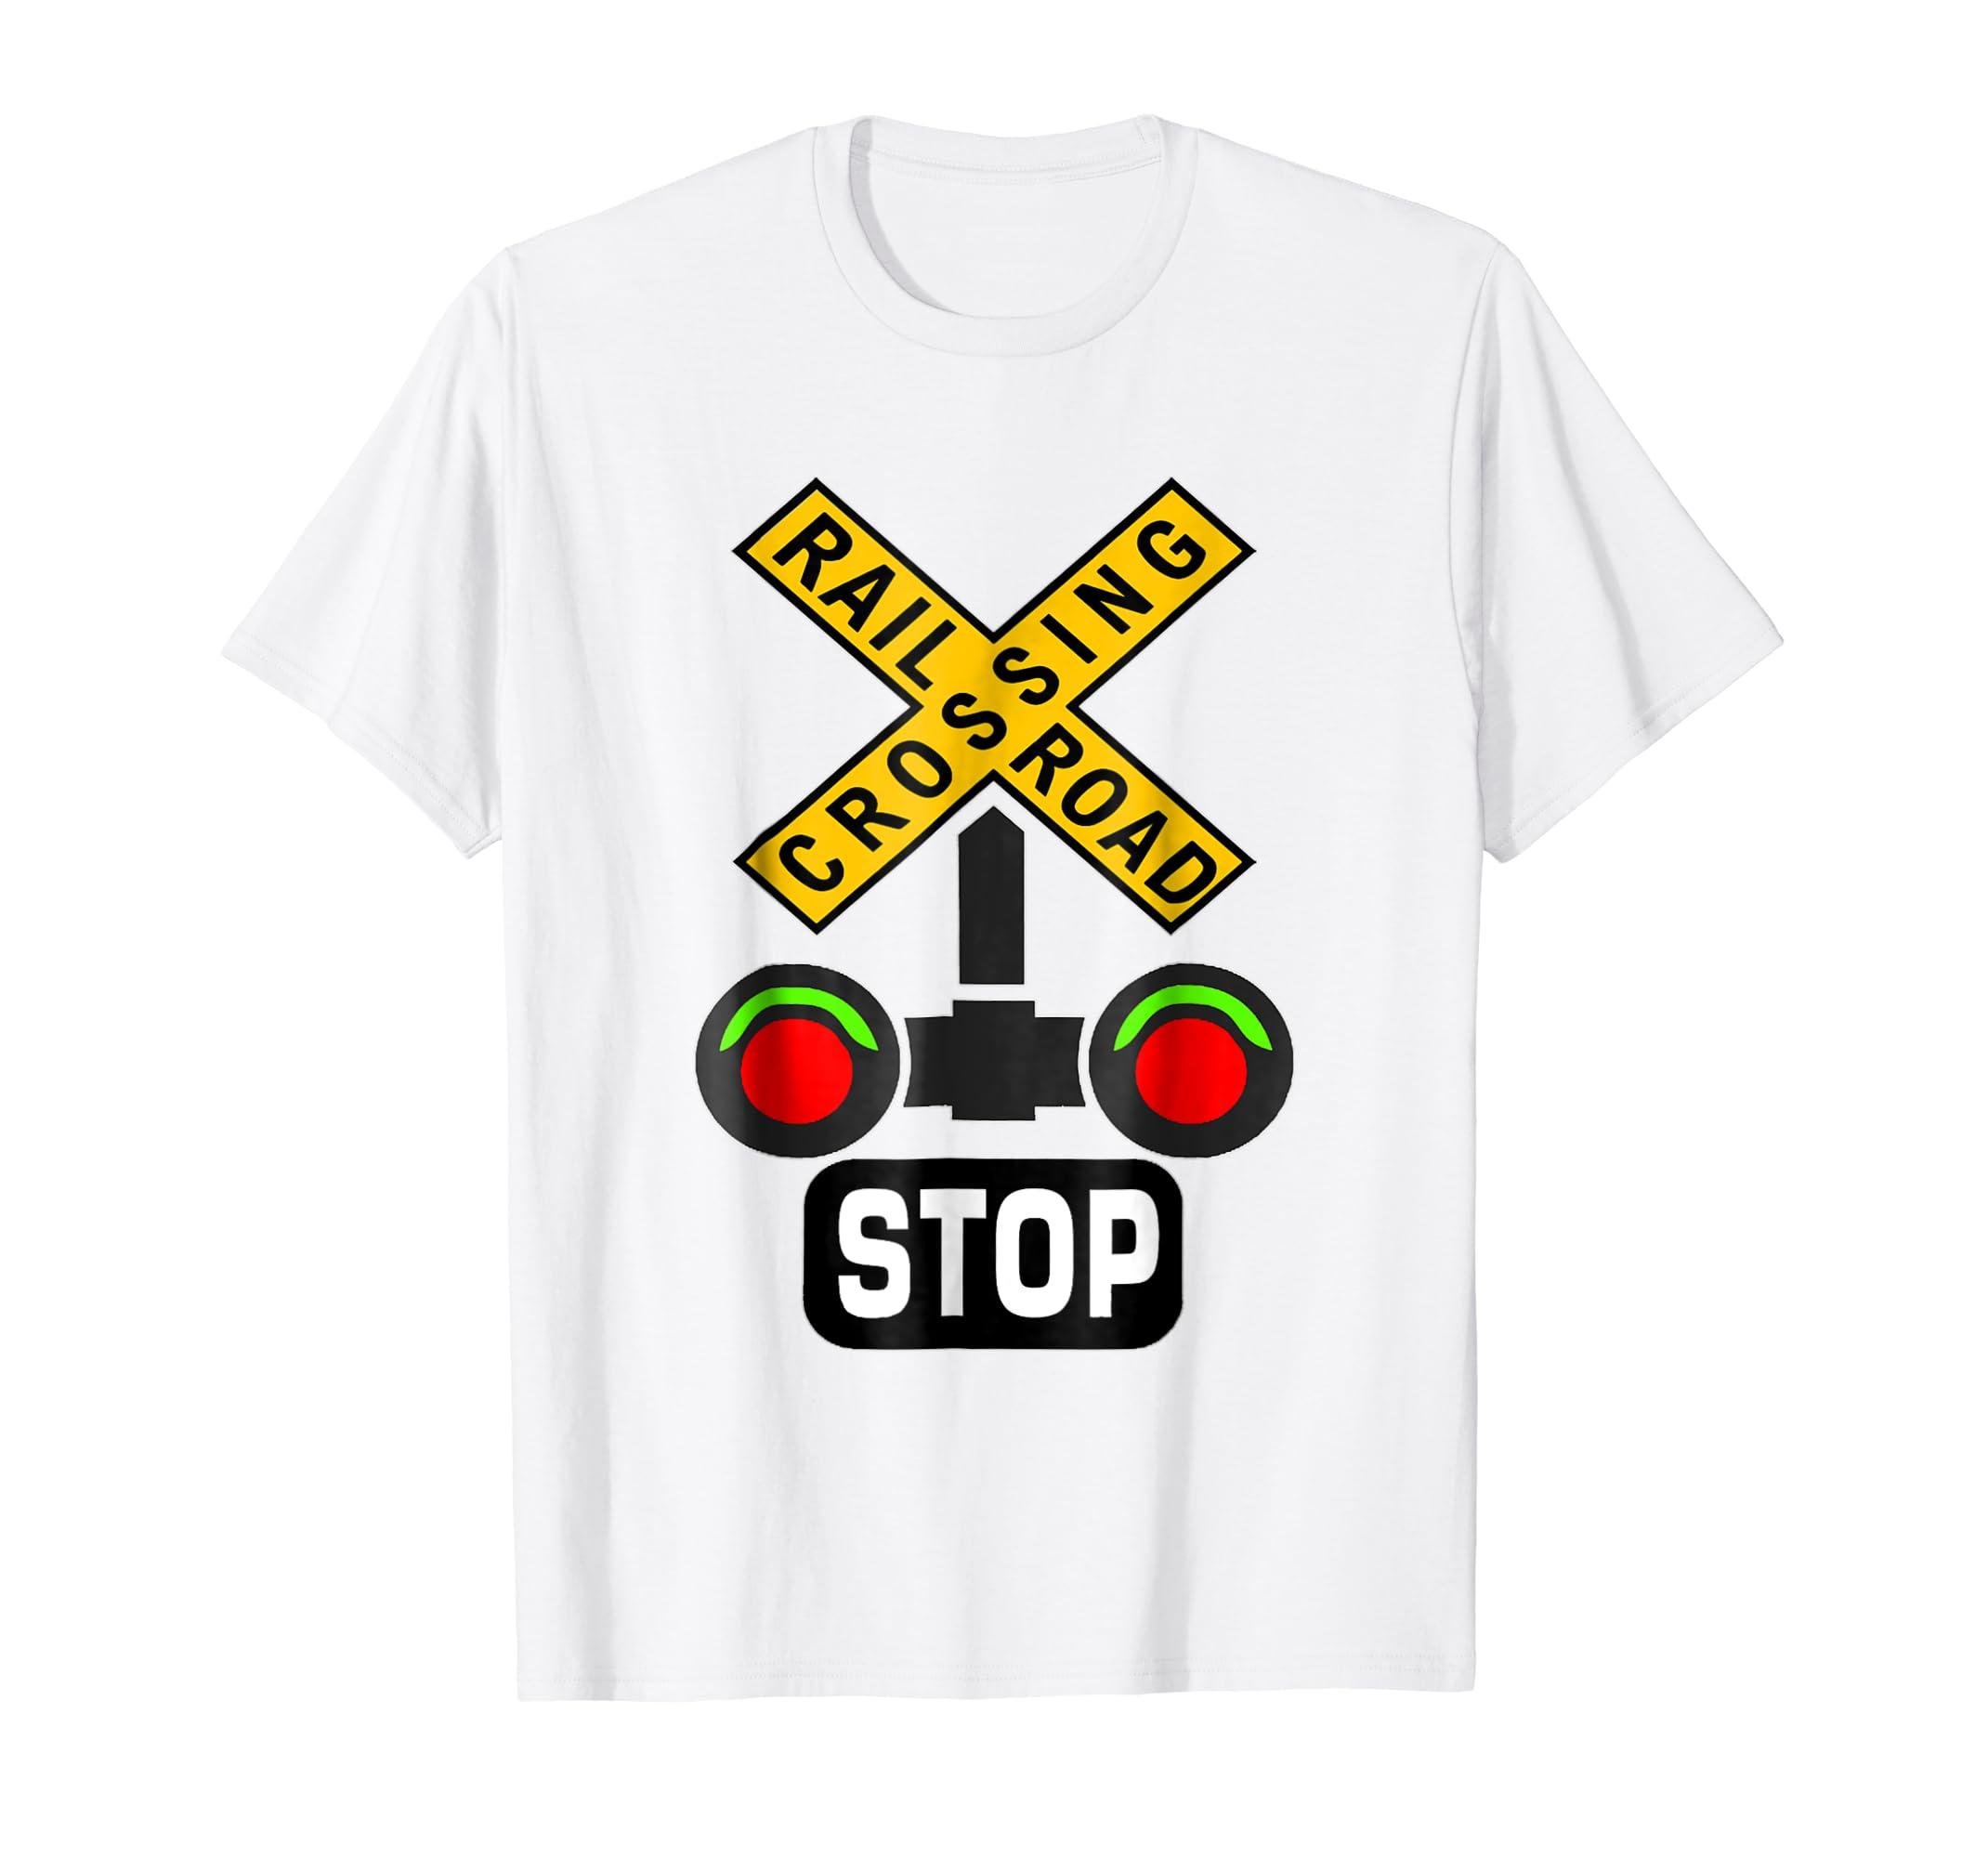 Train Railroad Crossing Lights Halloween Costume T Shirt-Colonhue